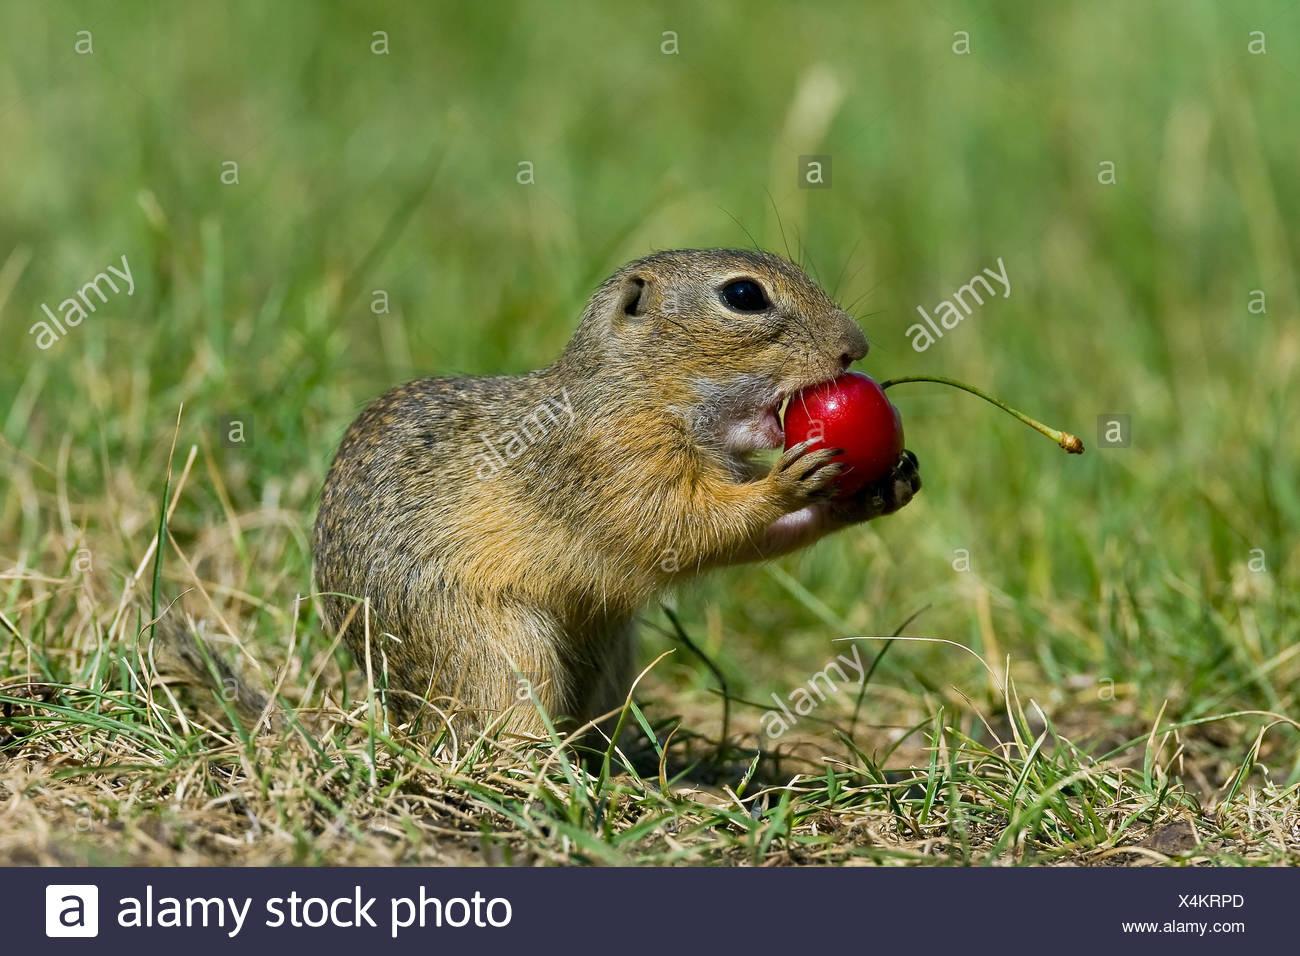 European ground squirrel, European suslik, European souslik (Citellus citellus, Spermophilus citellus), feeding on a cherry, Austria, Burgenland Stock Photo